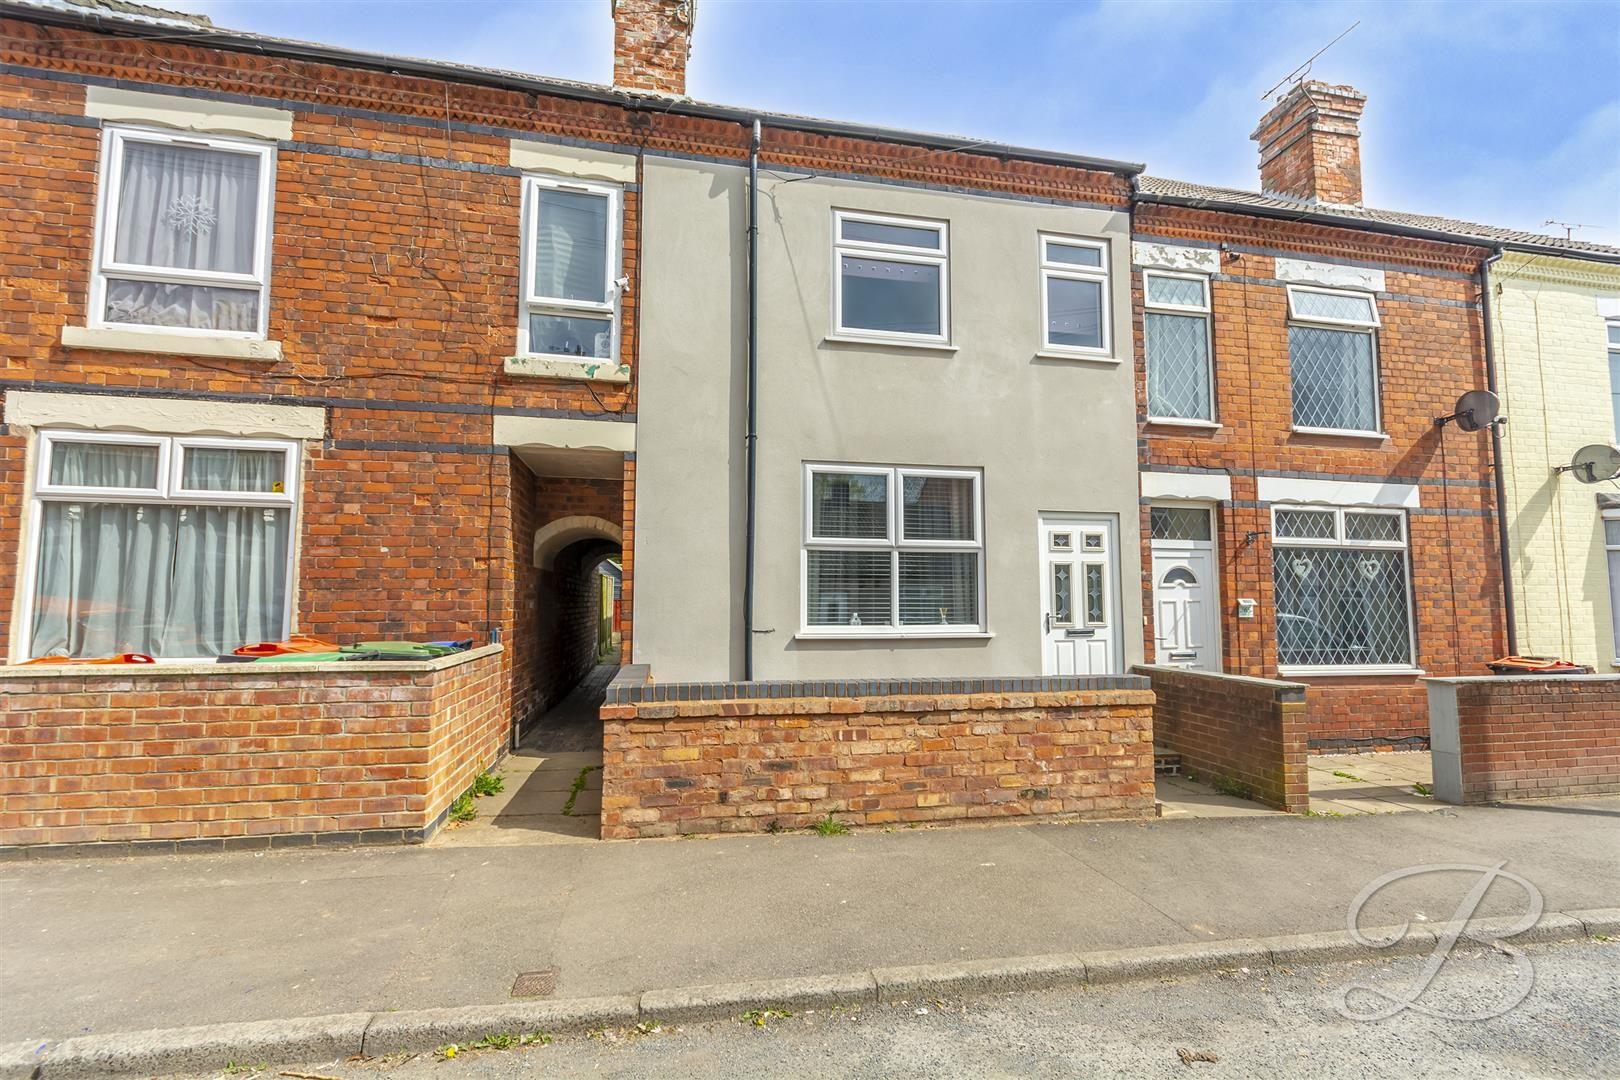 Property photo 1 of 23. Ccltd1.Jpg